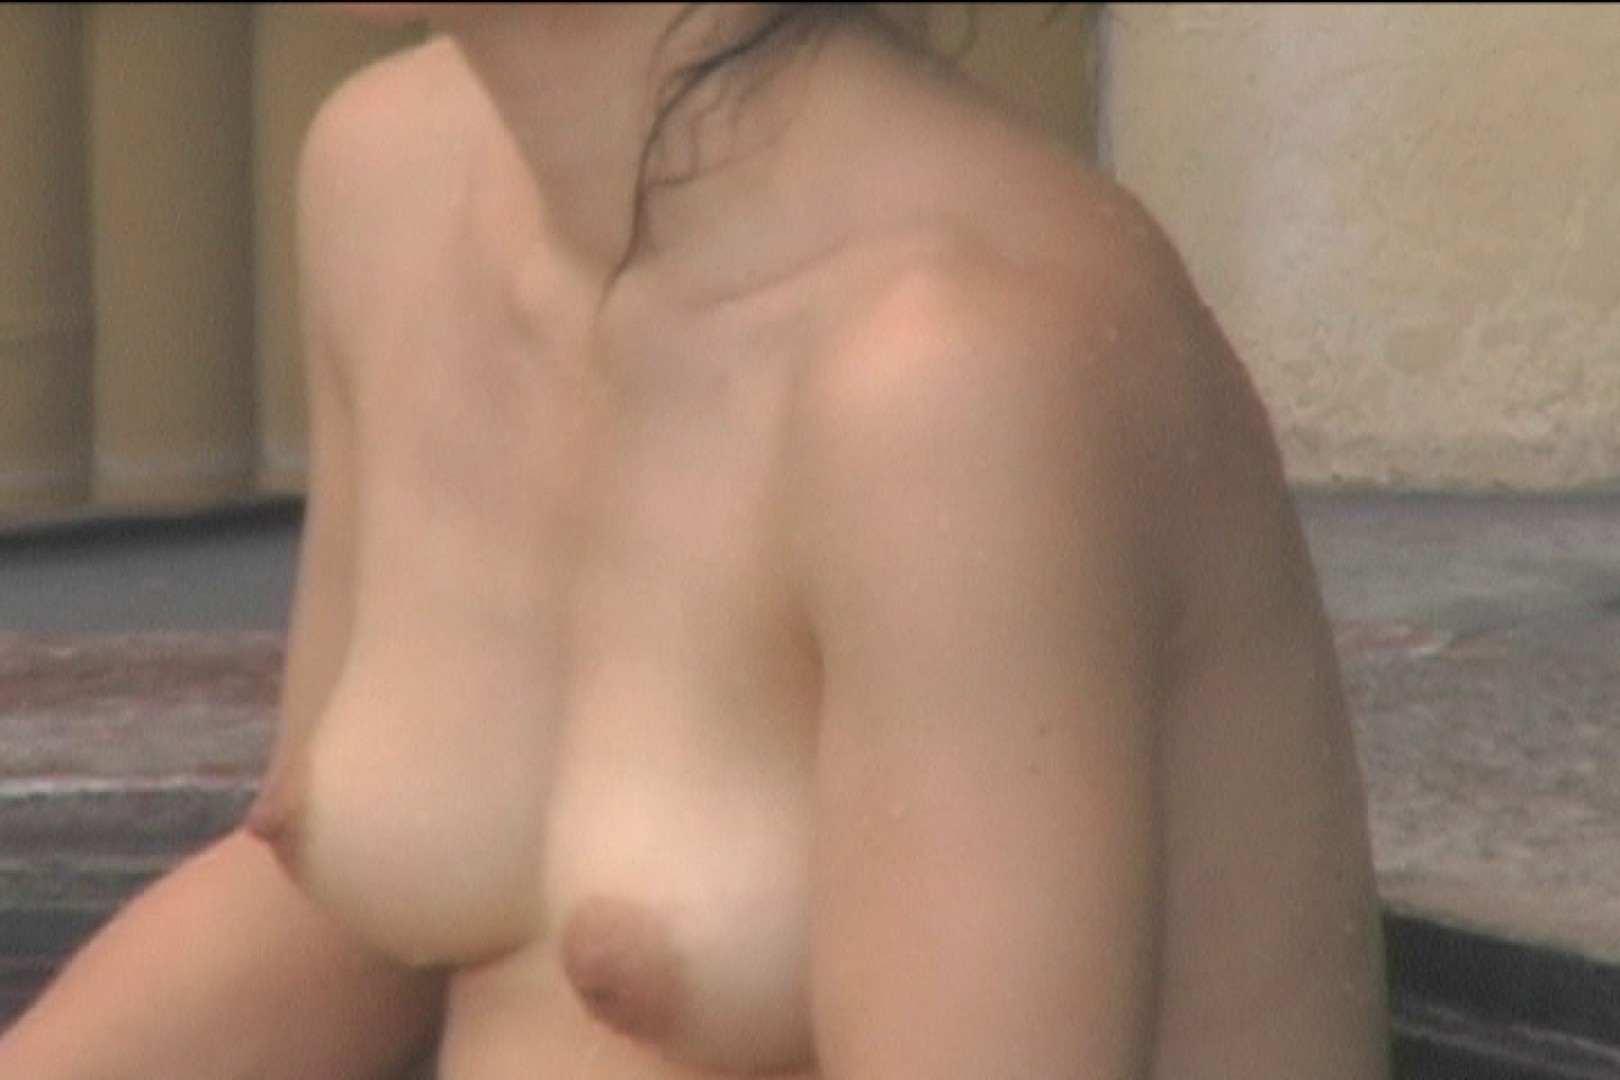 Aquaな露天風呂Vol.533 綺麗なOLたち オマンコ無修正動画無料 108枚 95